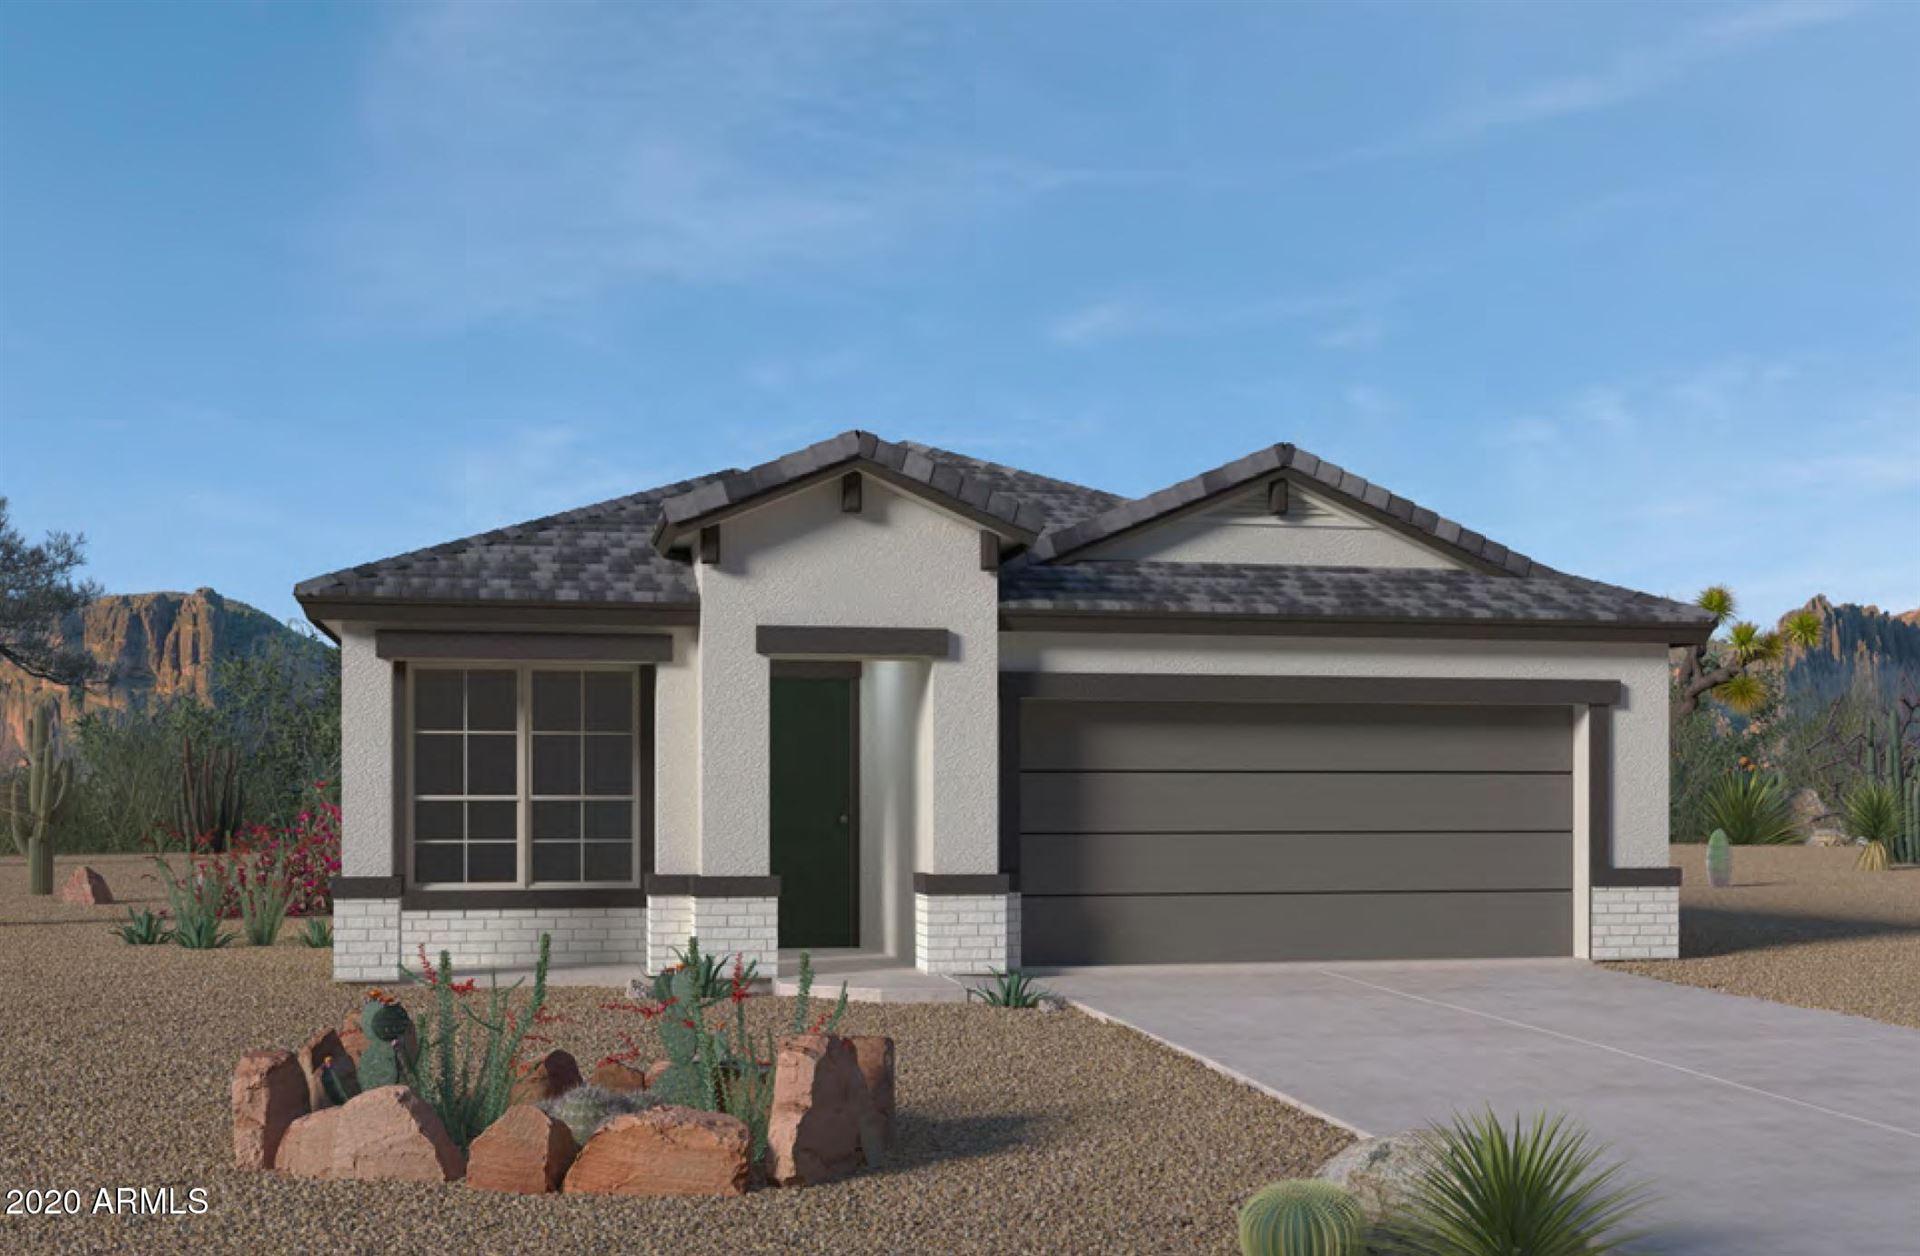 Photo of 38190 W SAN ILDEFANSO Avenue, Maricopa, AZ 85138 (MLS # 6202284)